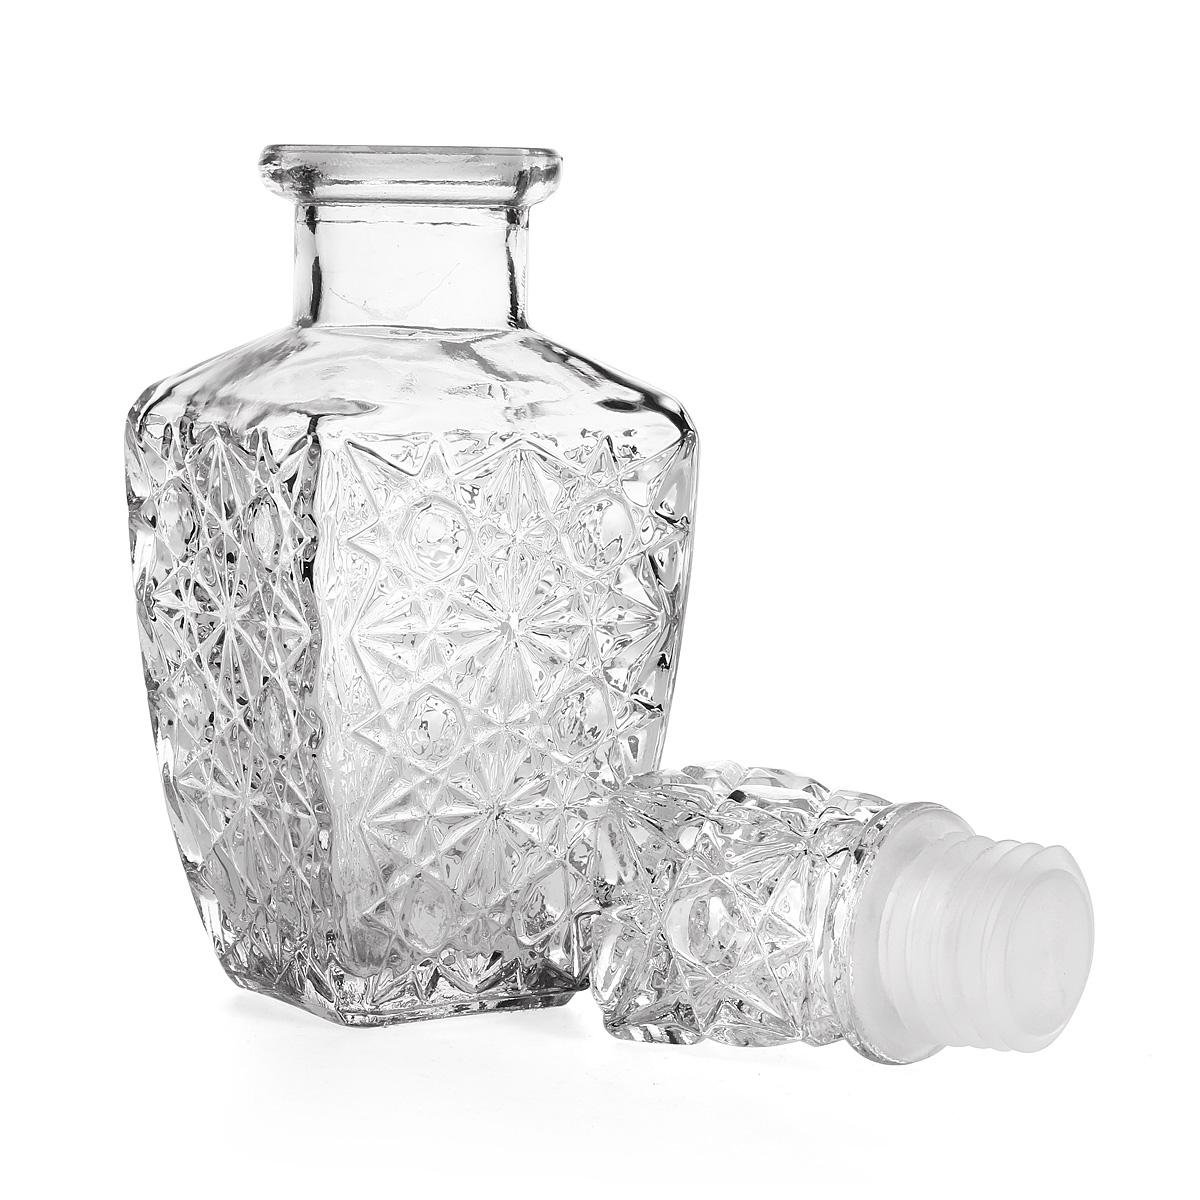 whiskey wine drinking glass decanter wine crystal bottle carafe. Black Bedroom Furniture Sets. Home Design Ideas